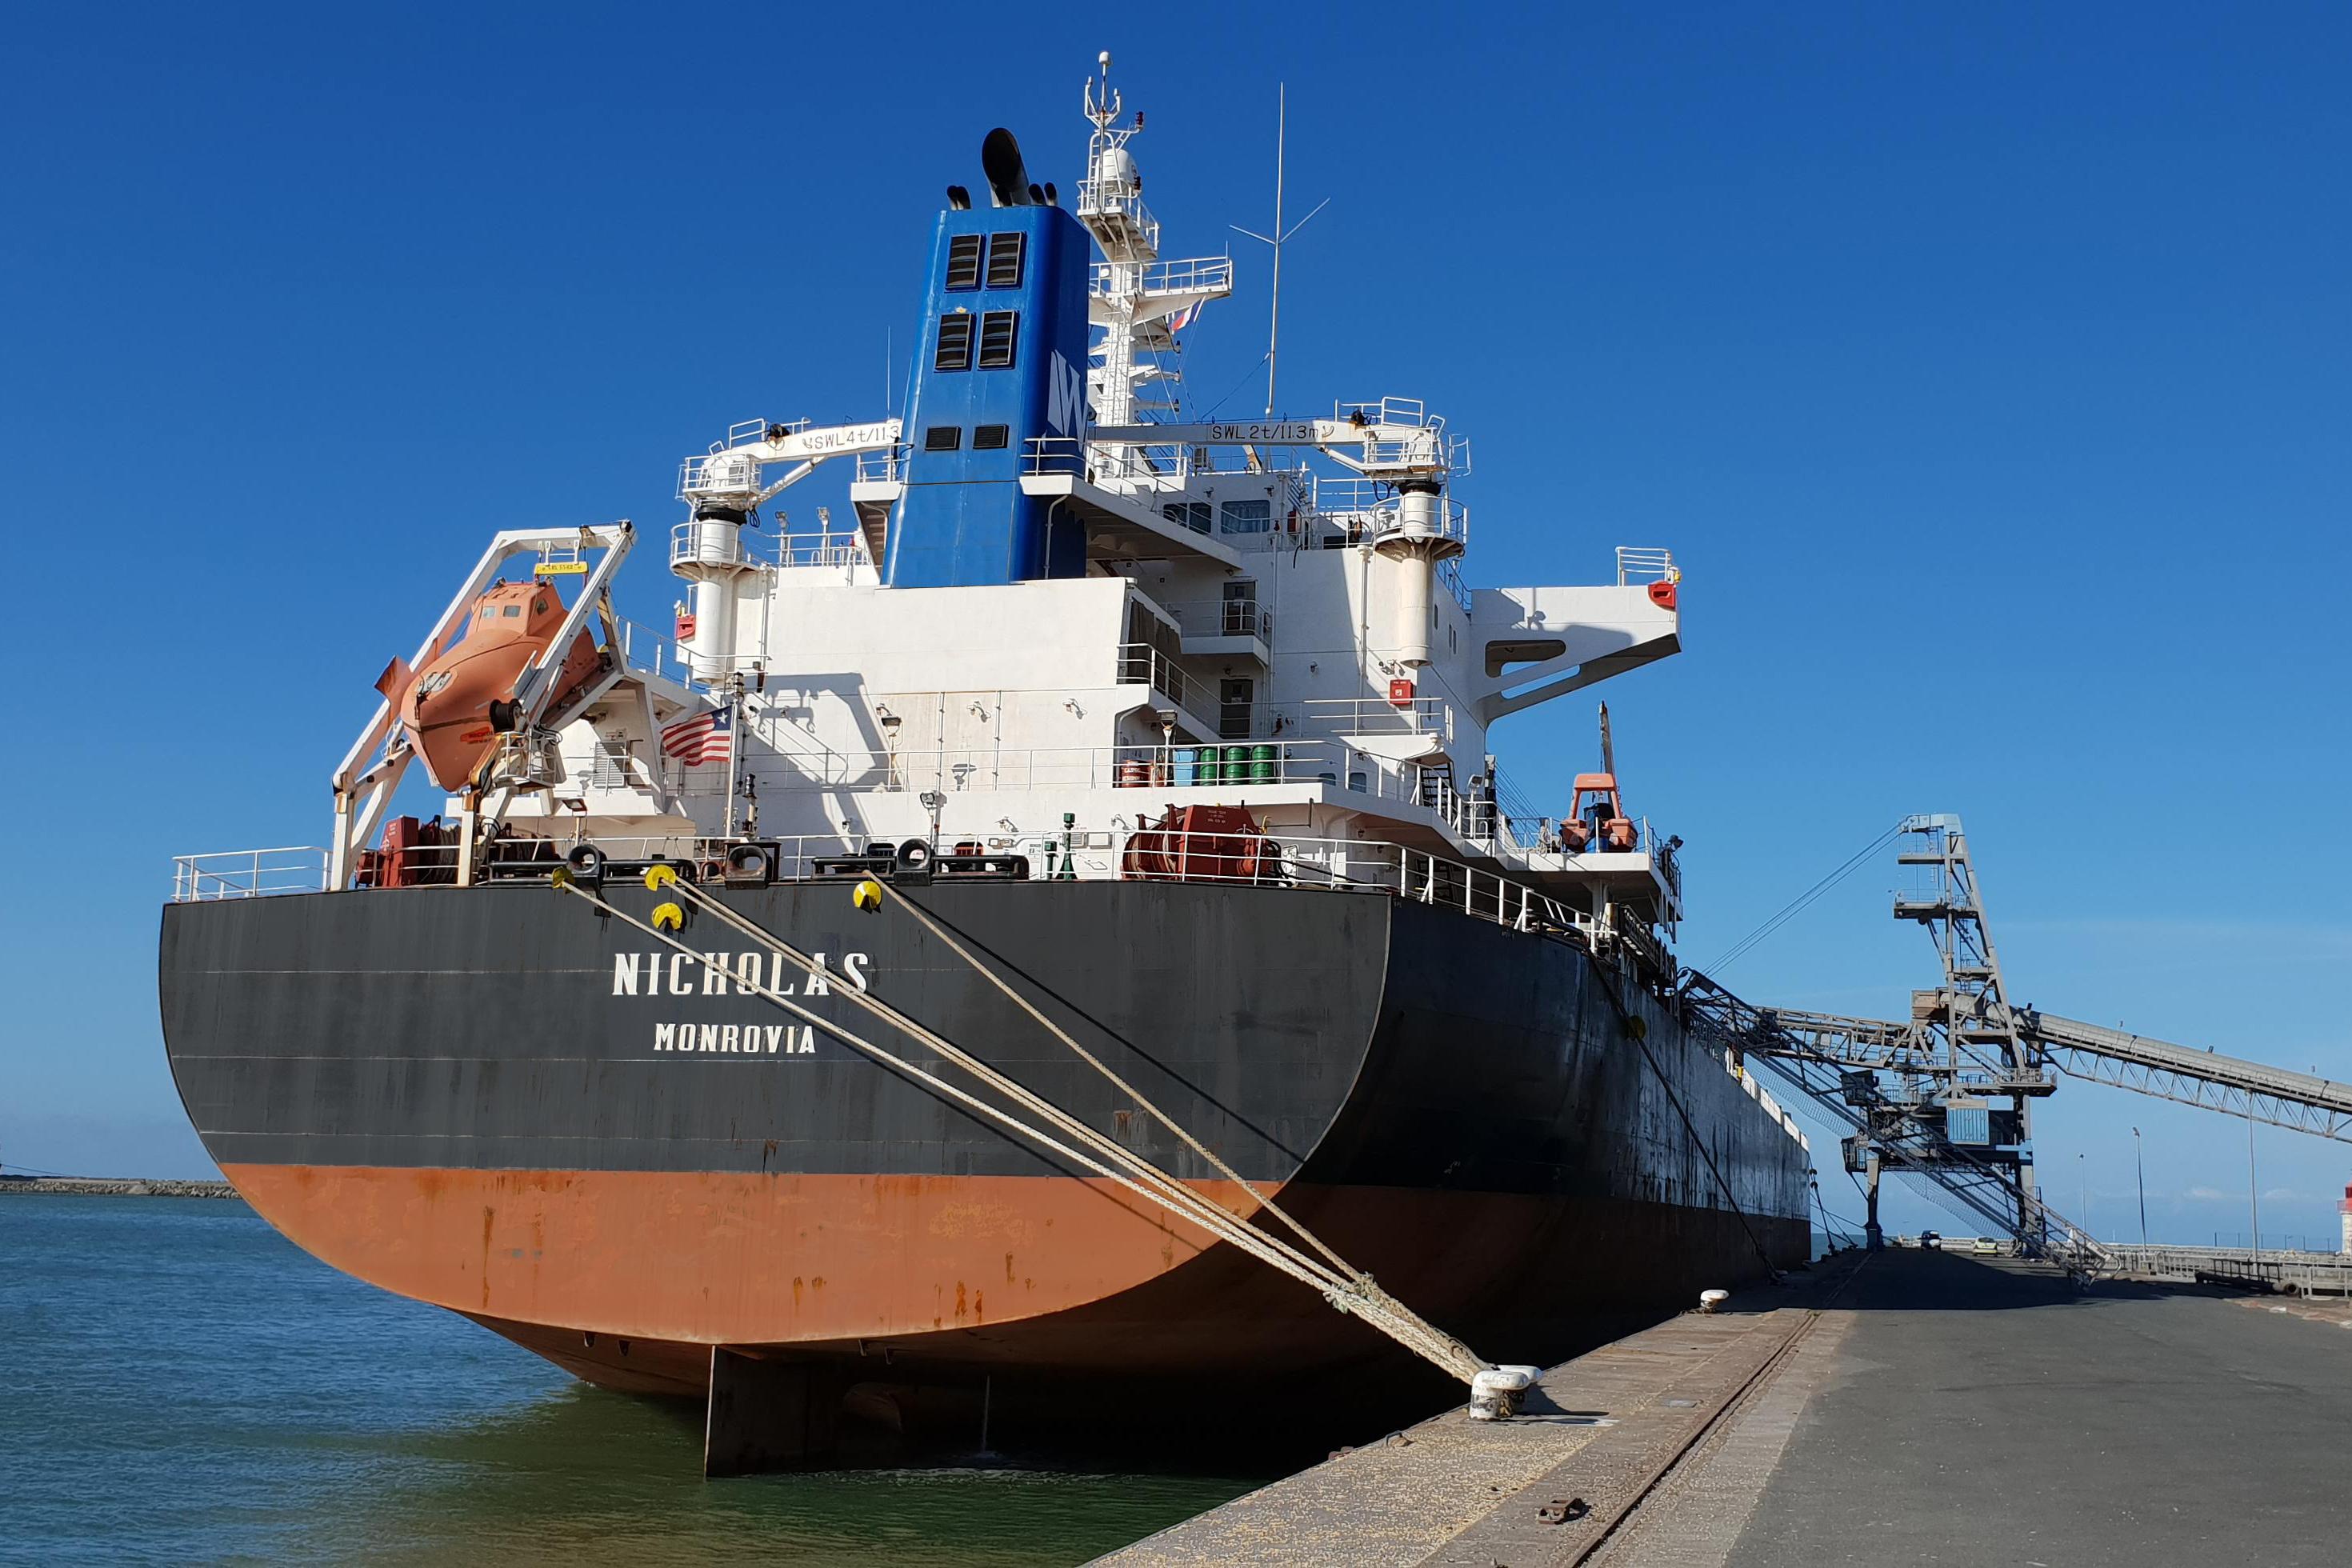 MV Nicholas - Crown 58 Supramax built in 2010 by Sinopacific Dayang